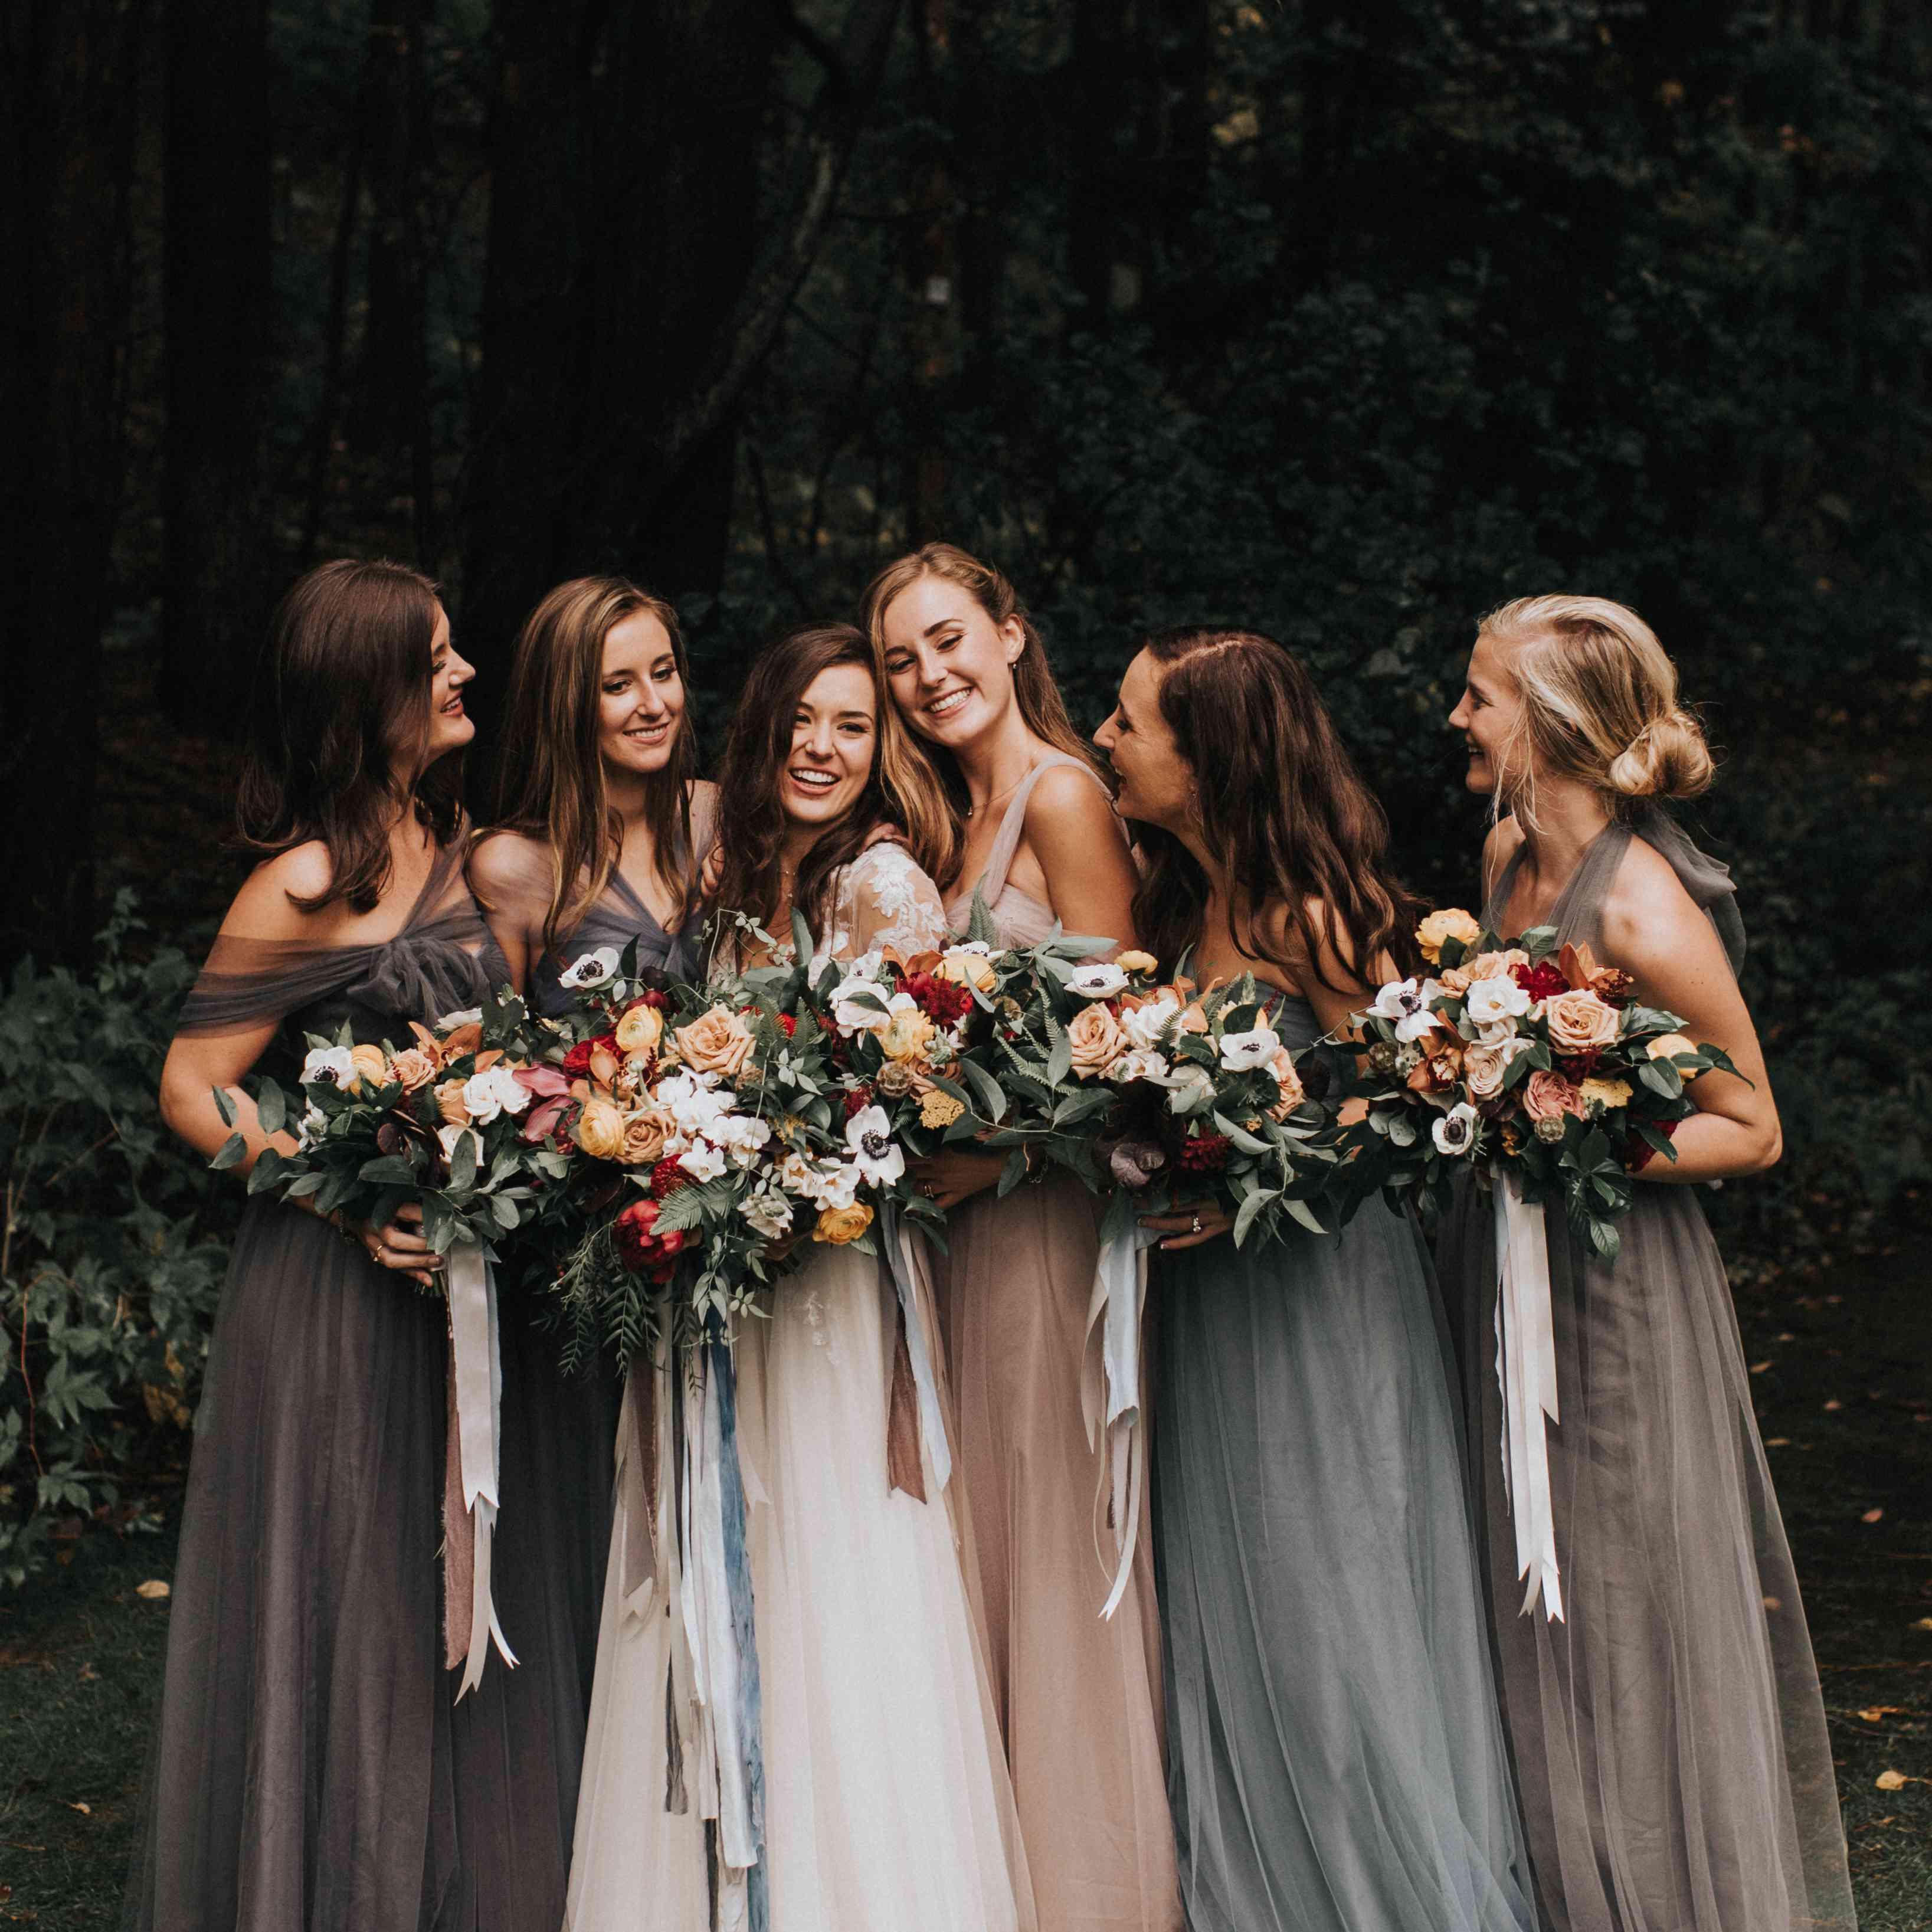 personalized michigan wedding, bride with bridesmaids